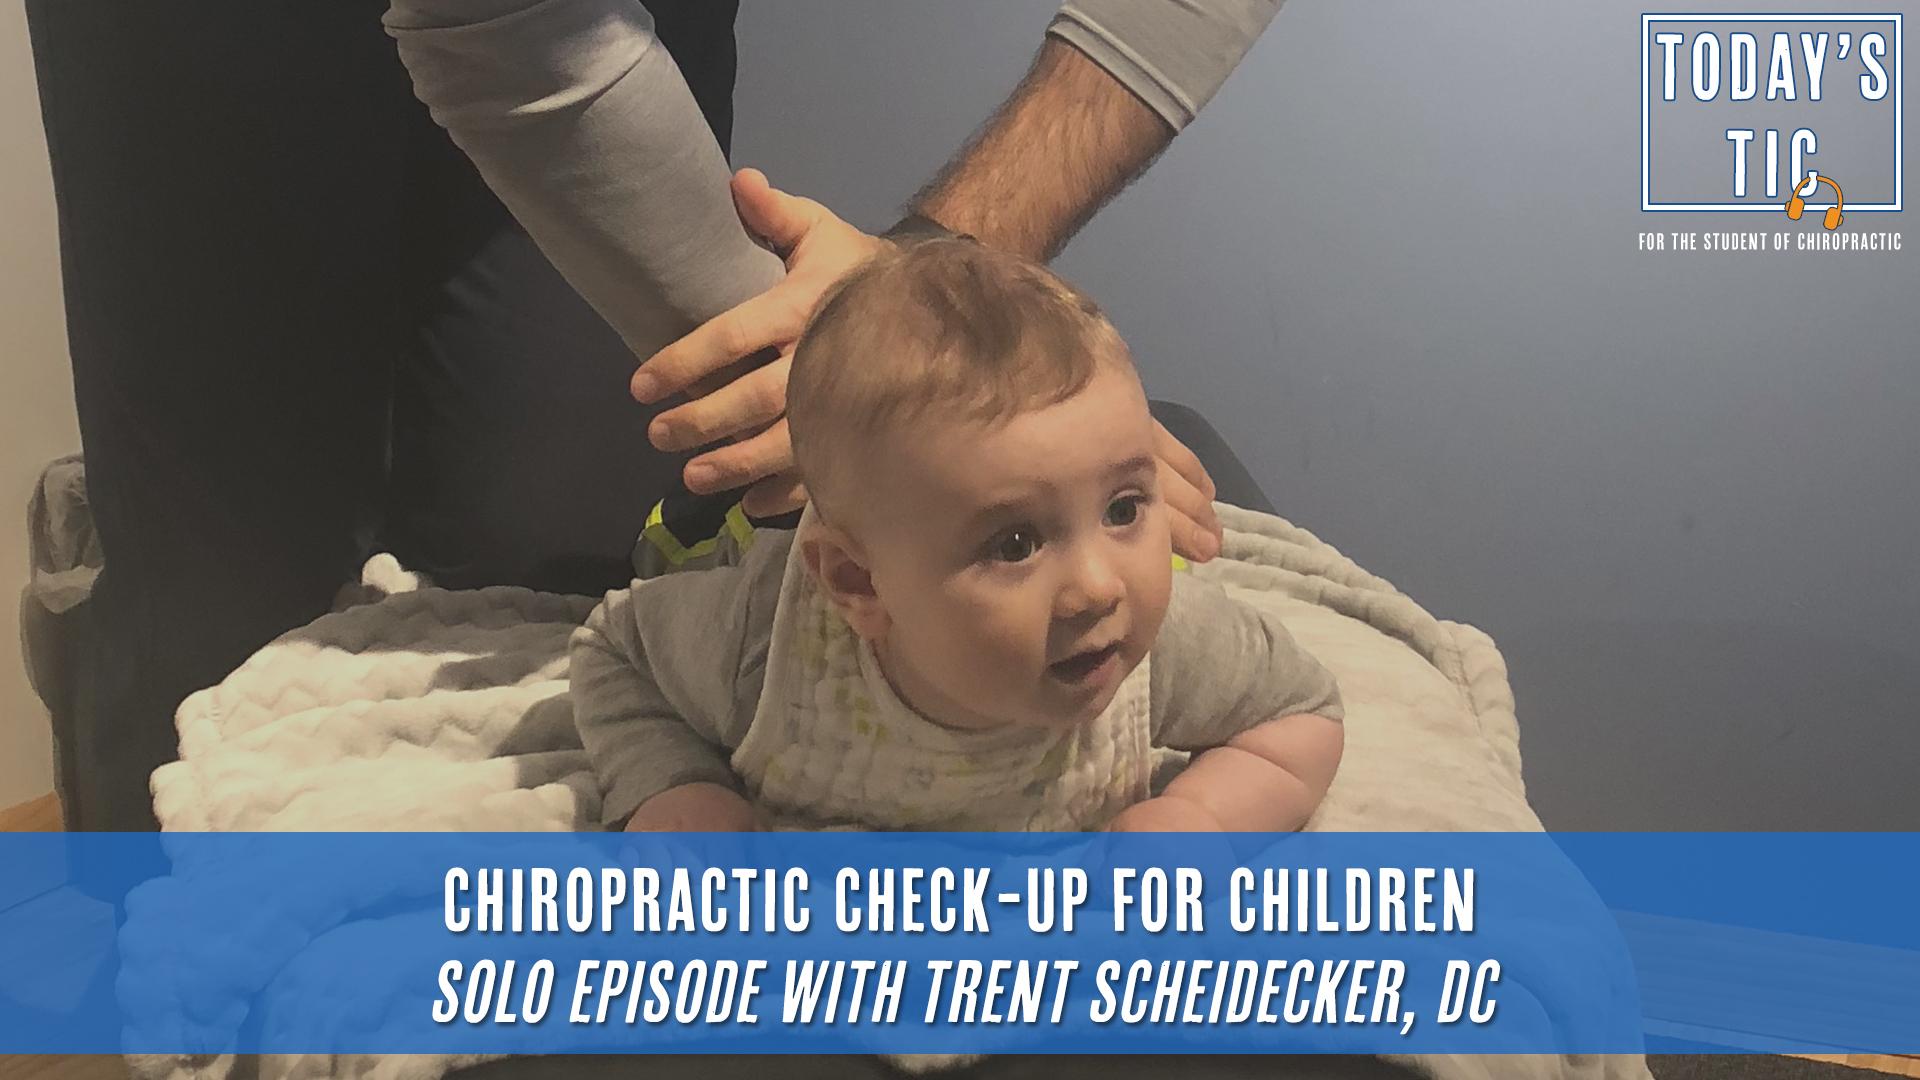 Chiropractic Check-up for Children Solo Episode with Trent Scheidecker DC